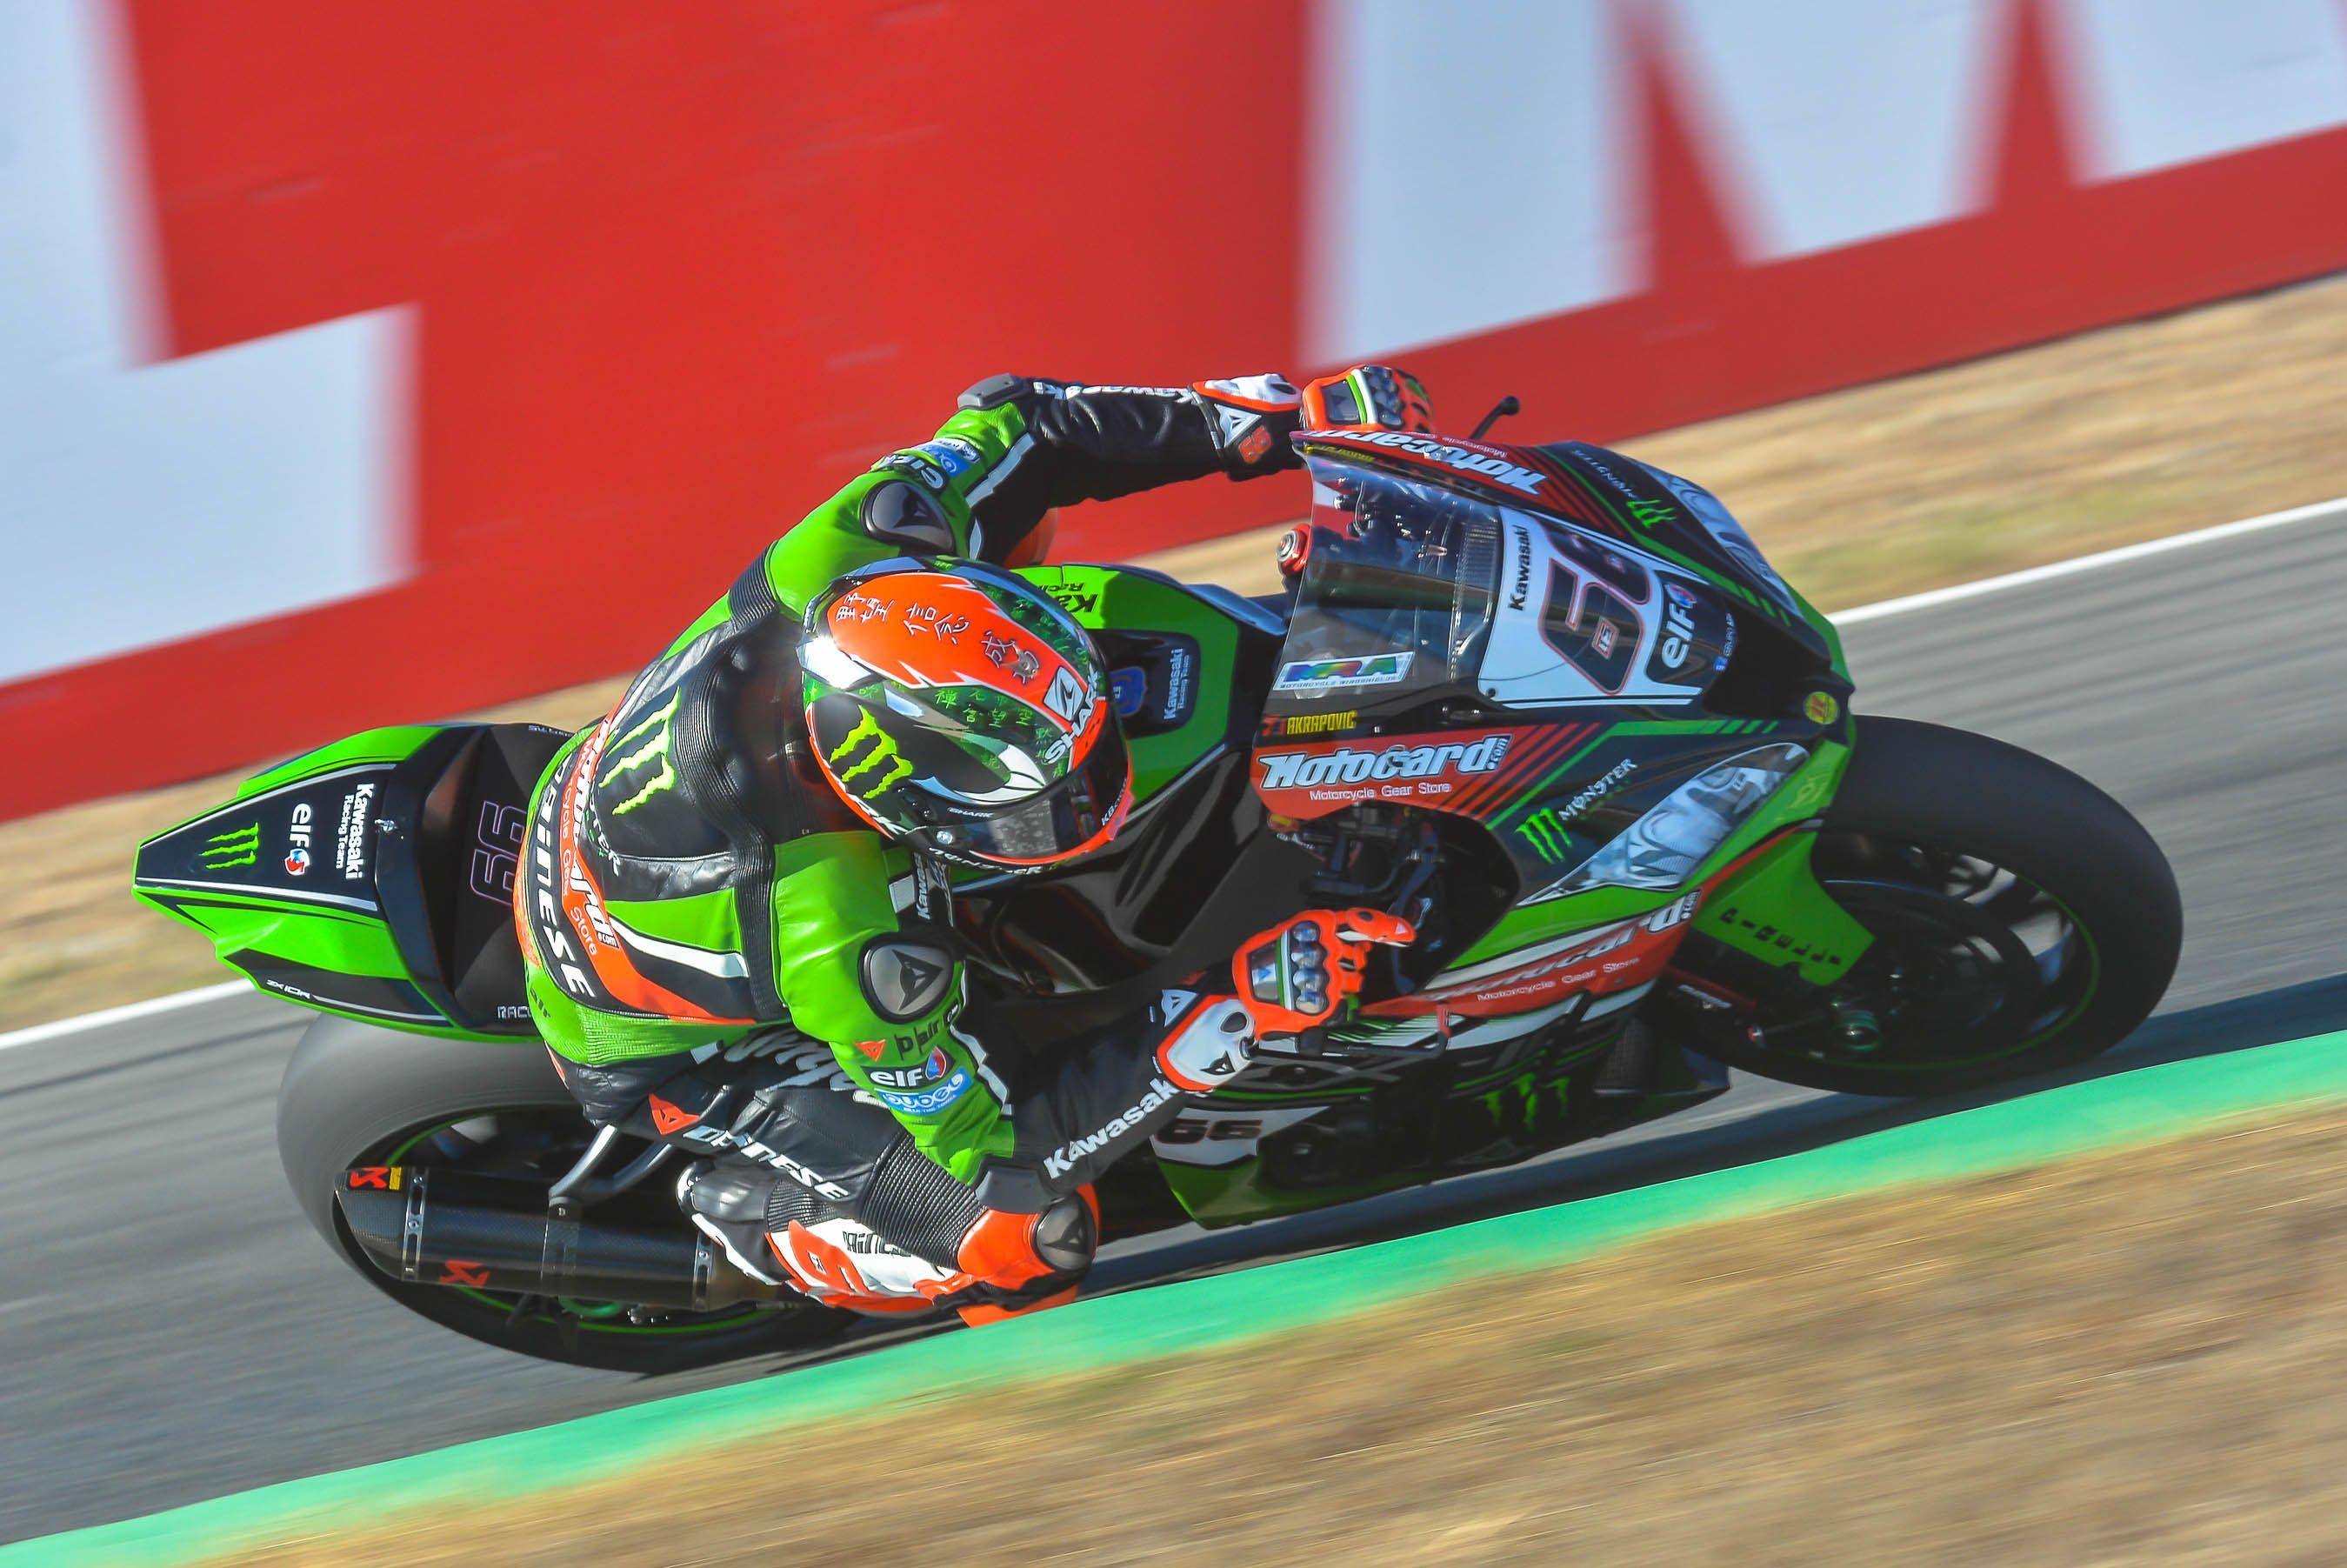 Tom Sykes - Superbike | Christian Cantizano para MIRA Jerez